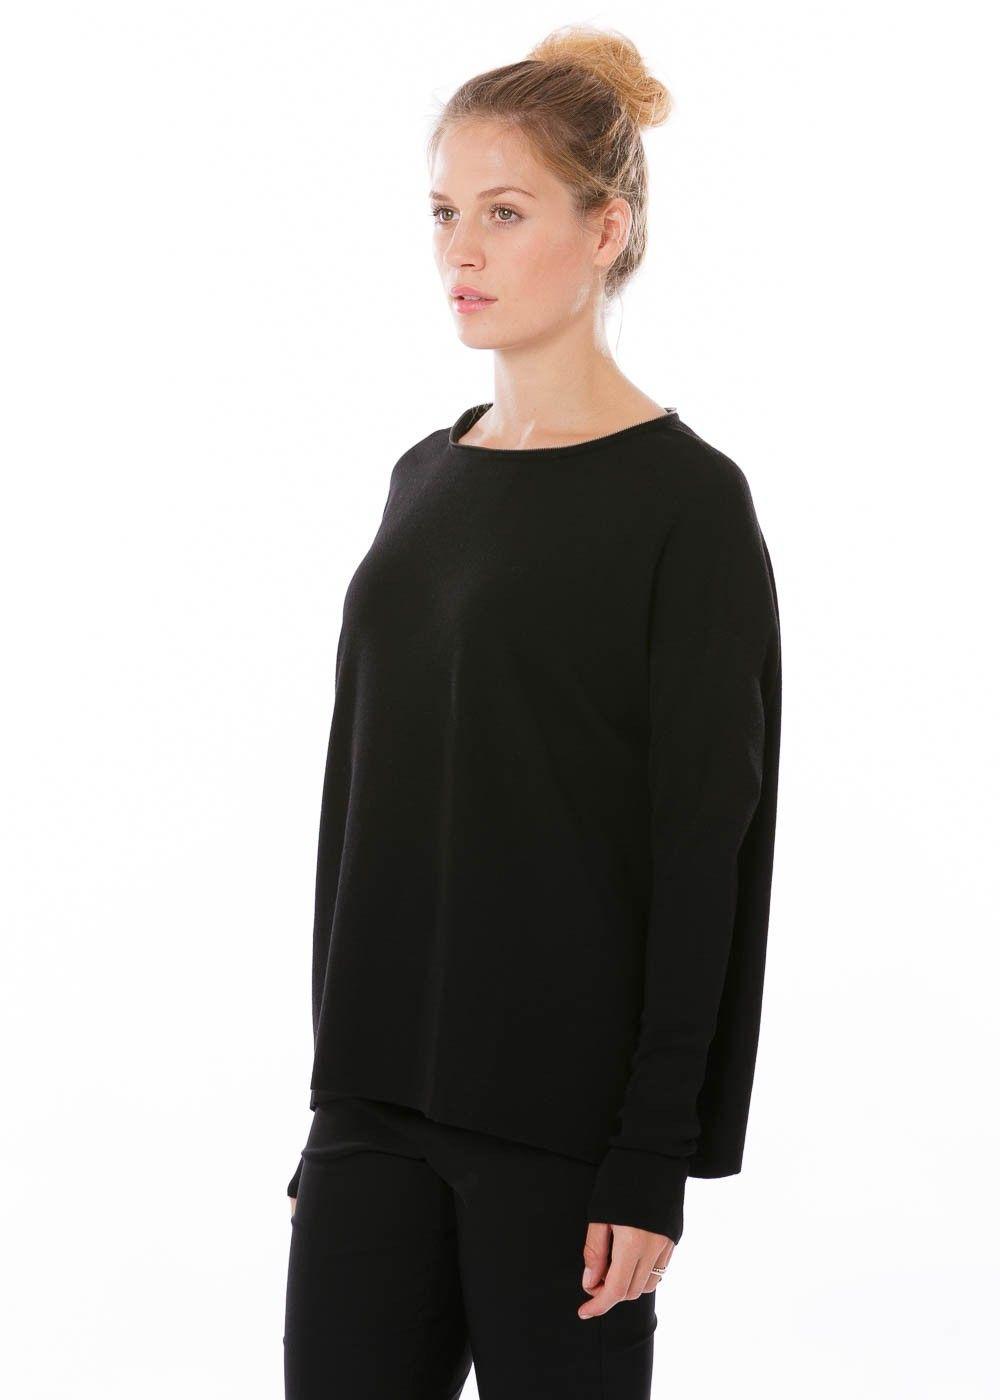 Strickpullover Grace von annette görtz bei nobananas mode #nobananas #annettegörtz #knit #pullover #black #long #neck #viscose #fw16 #round